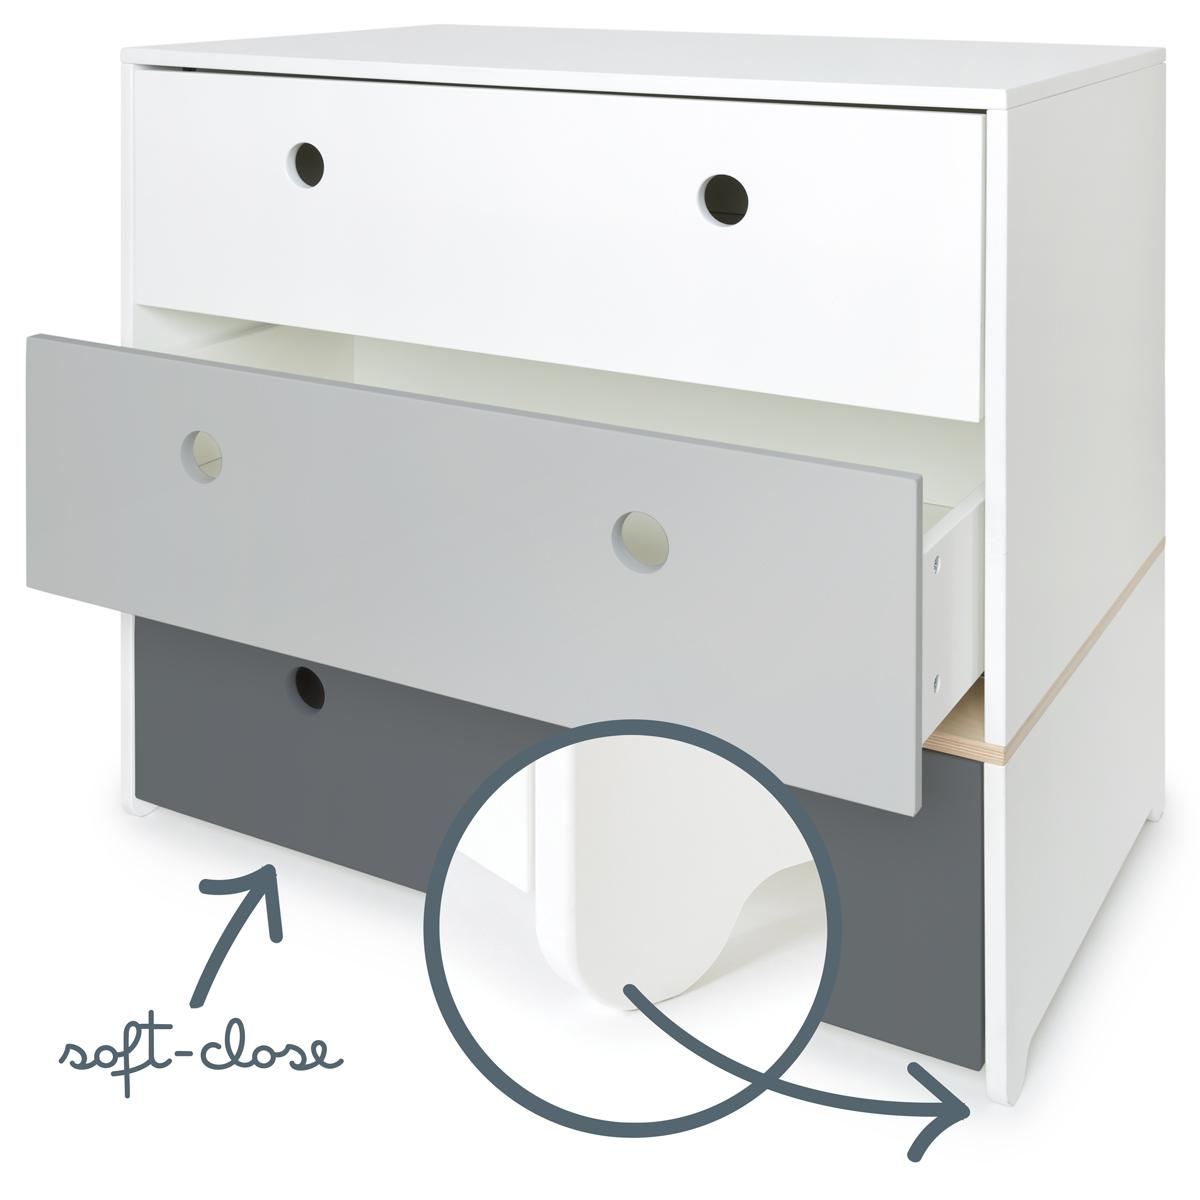 Commode COLORFLEX façades tiroirs white-pearl grey-space grey